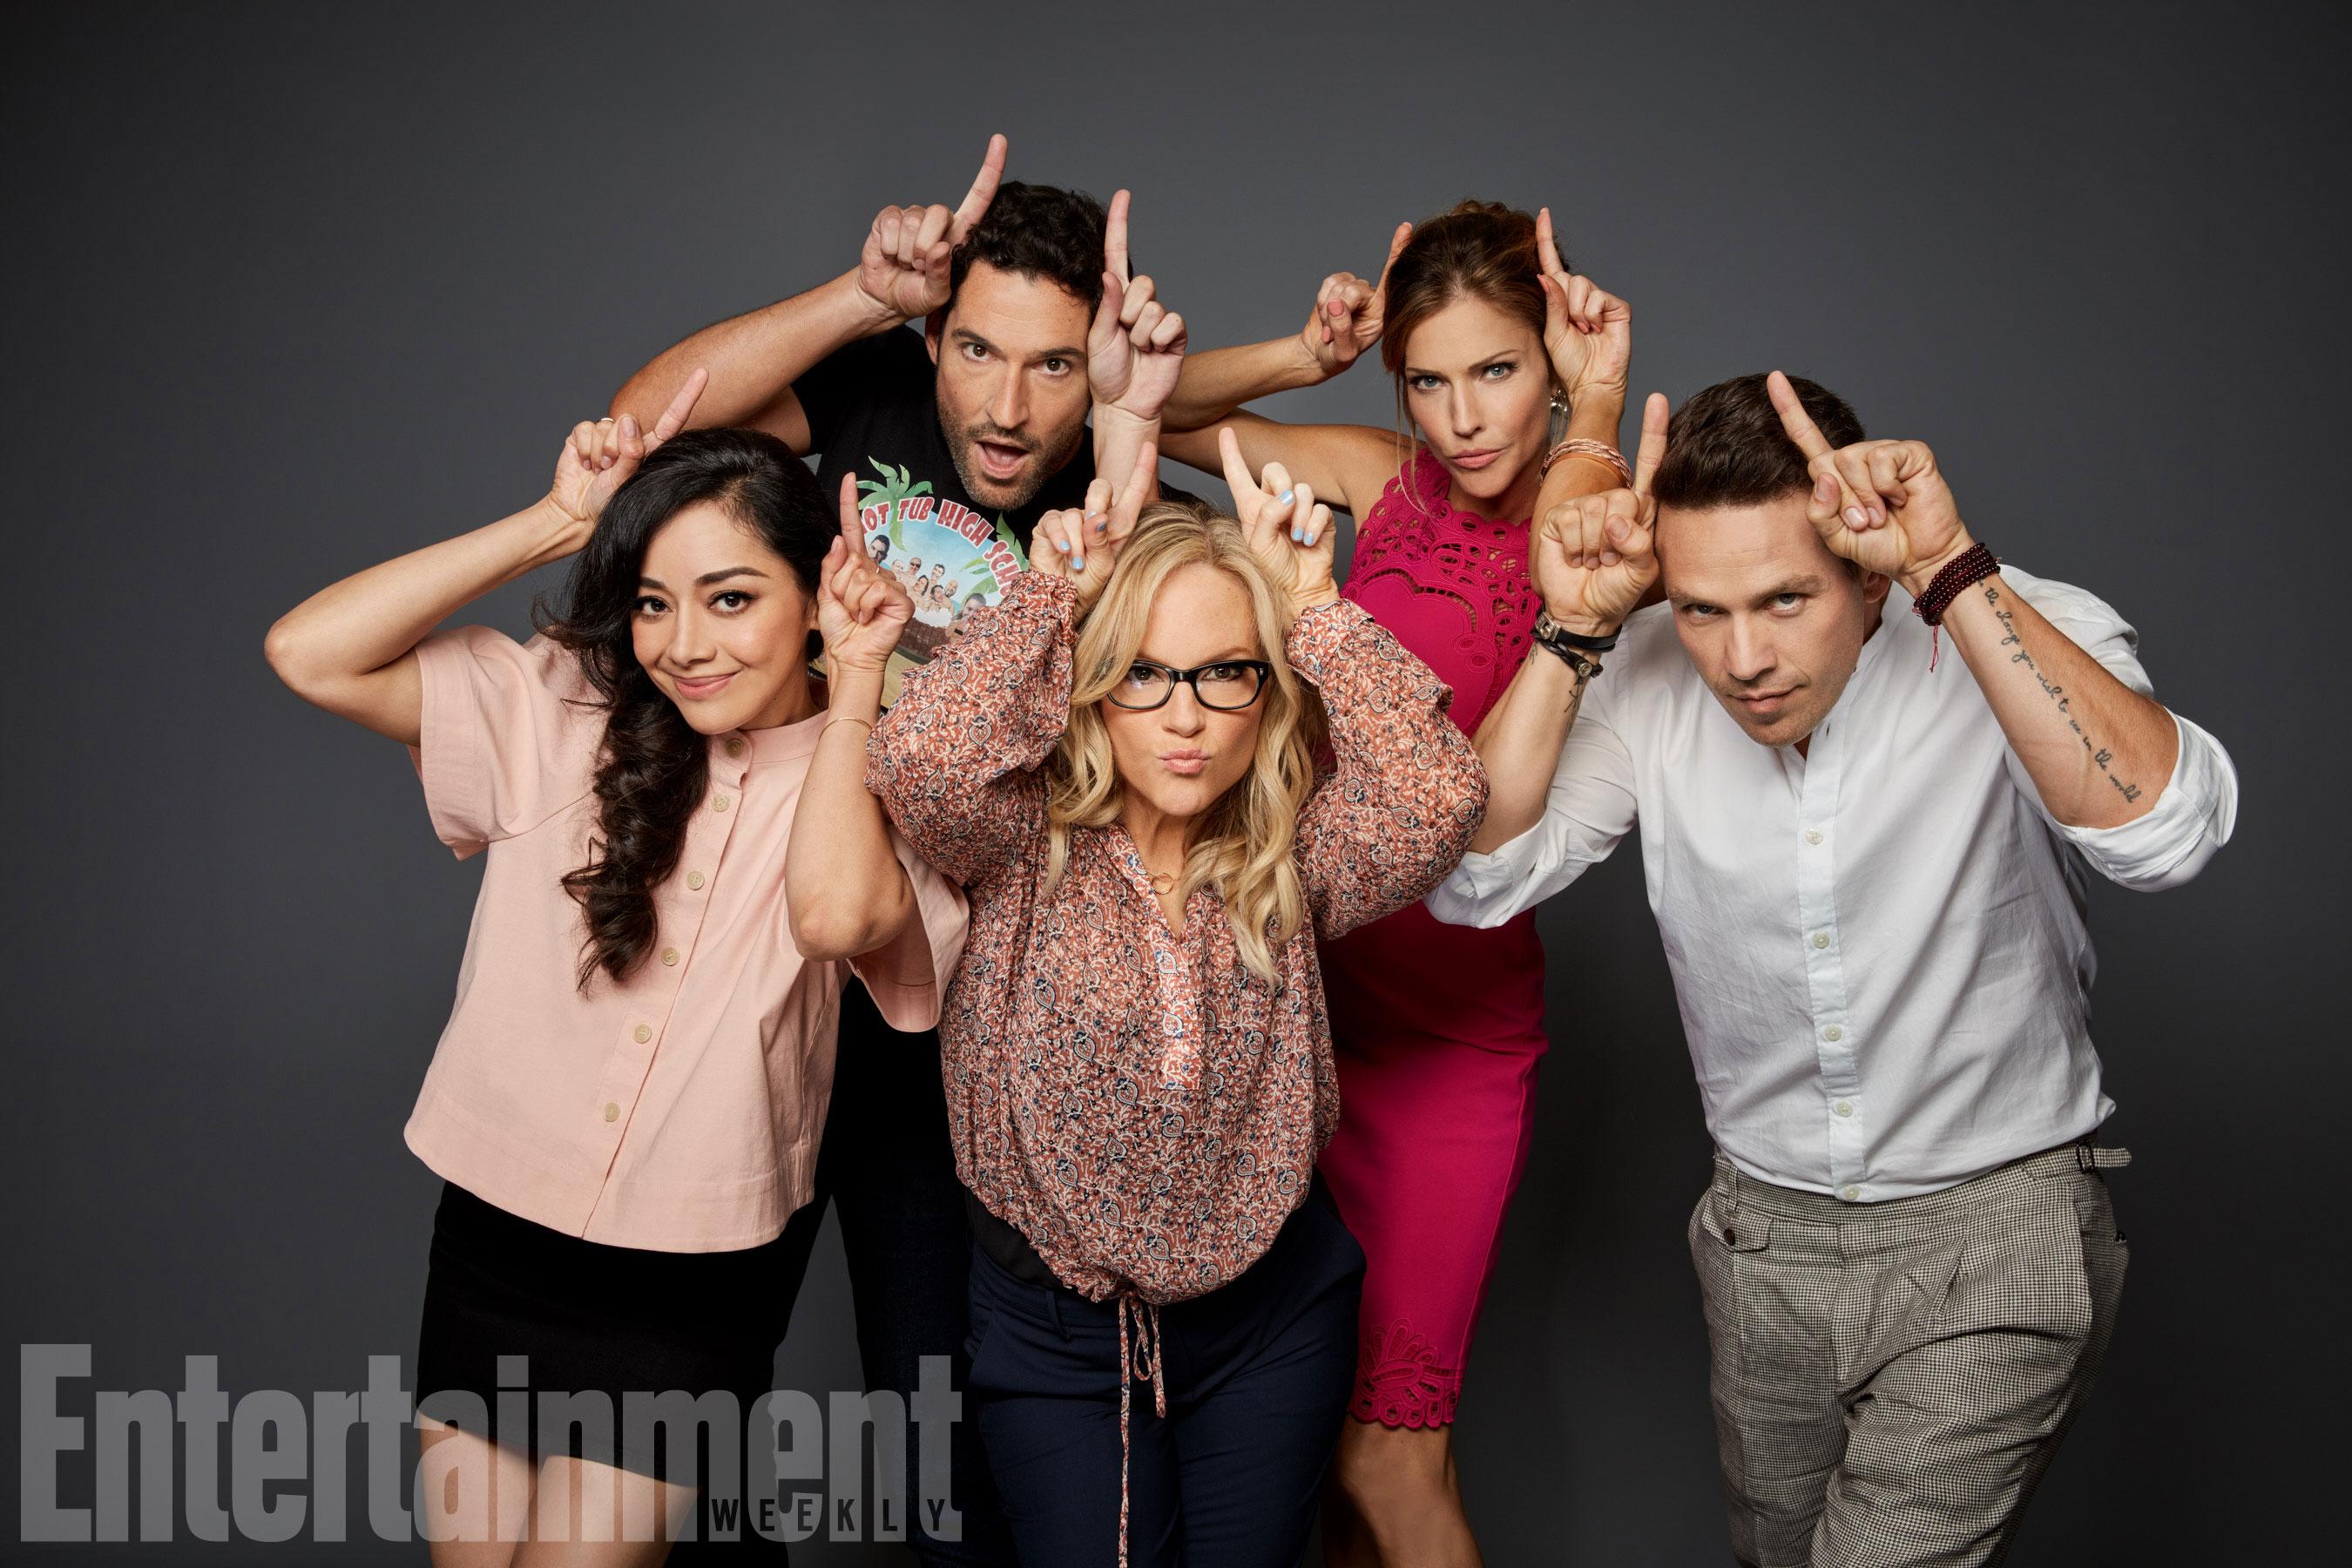 Aimee Garcia, Tom Ellis, Rachael Harris, Tricia Helfer és Kevin Alejandro (Lucifer)